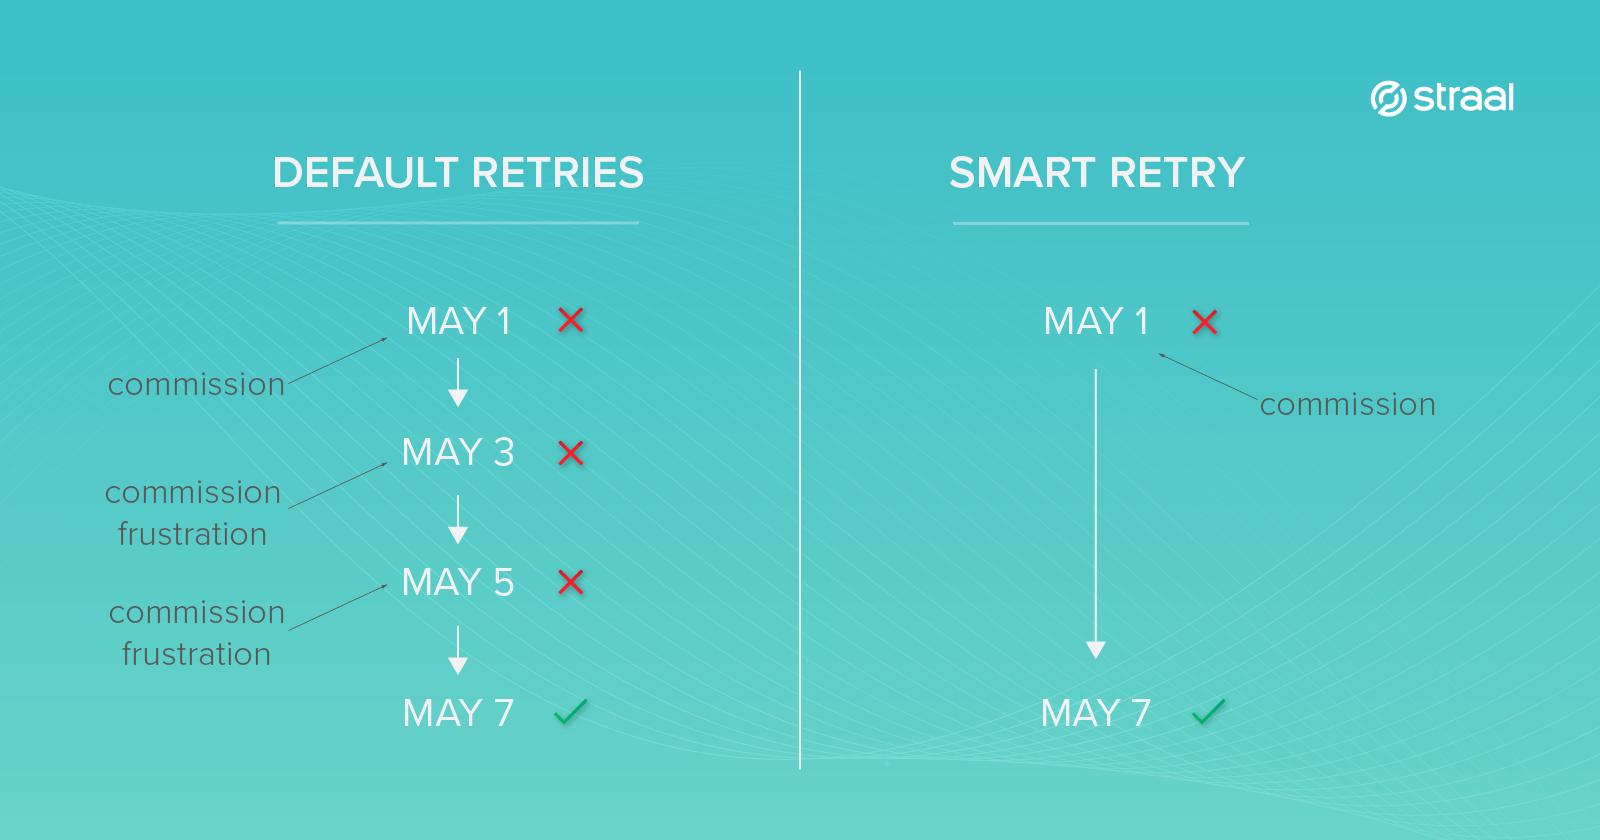 Default retries vs. Smart Retry